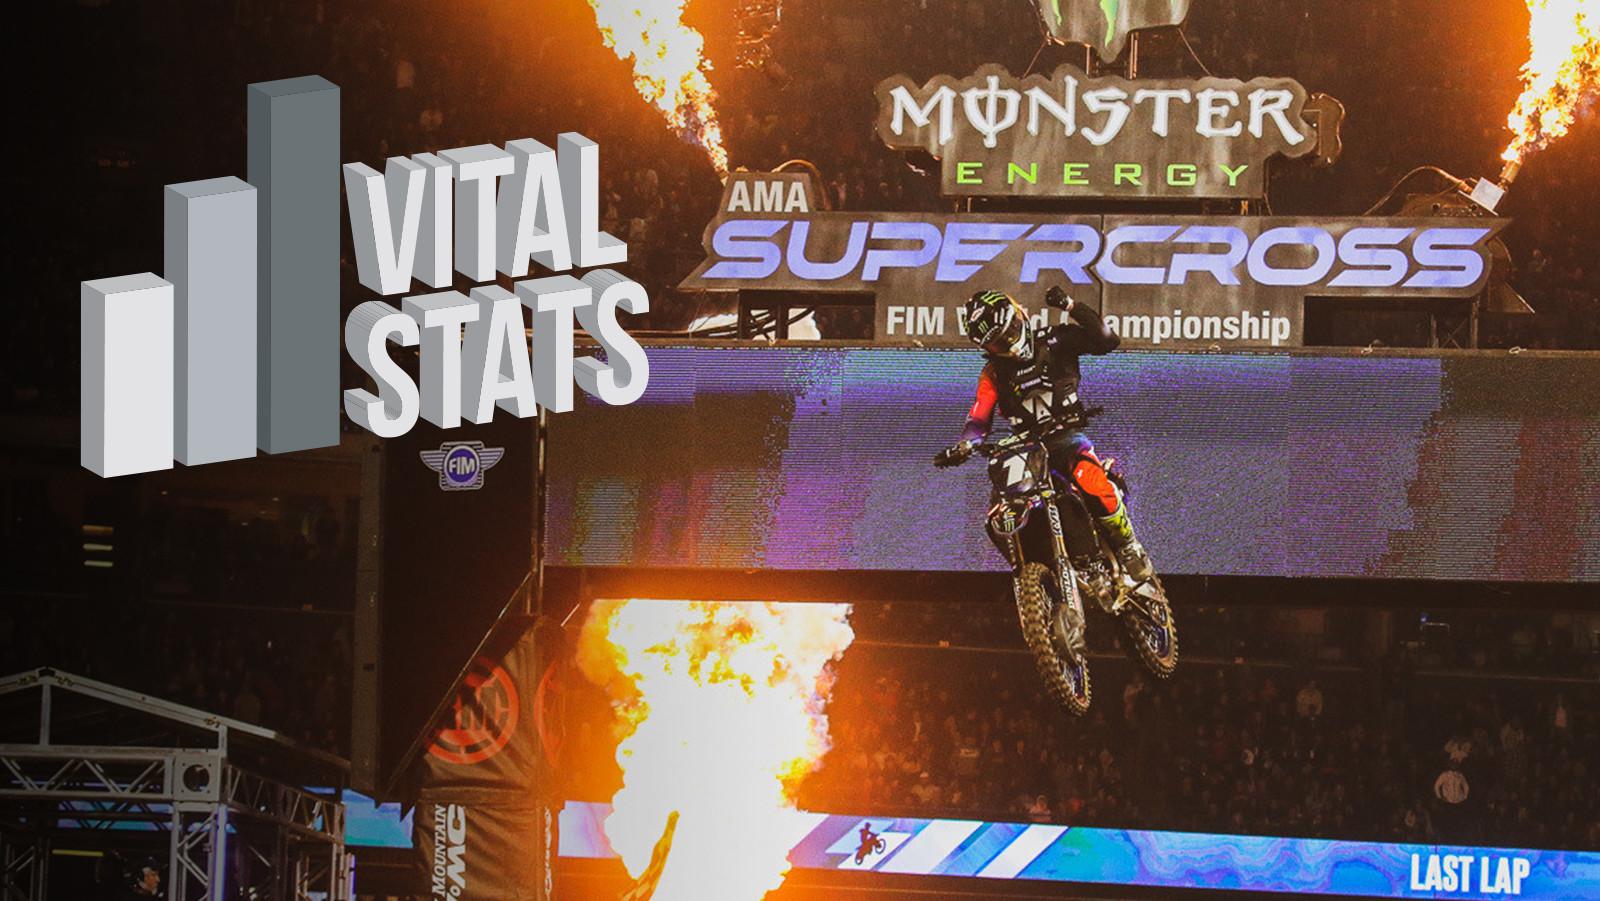 Vital Stats: 2020 Supercross Championship, Week 3